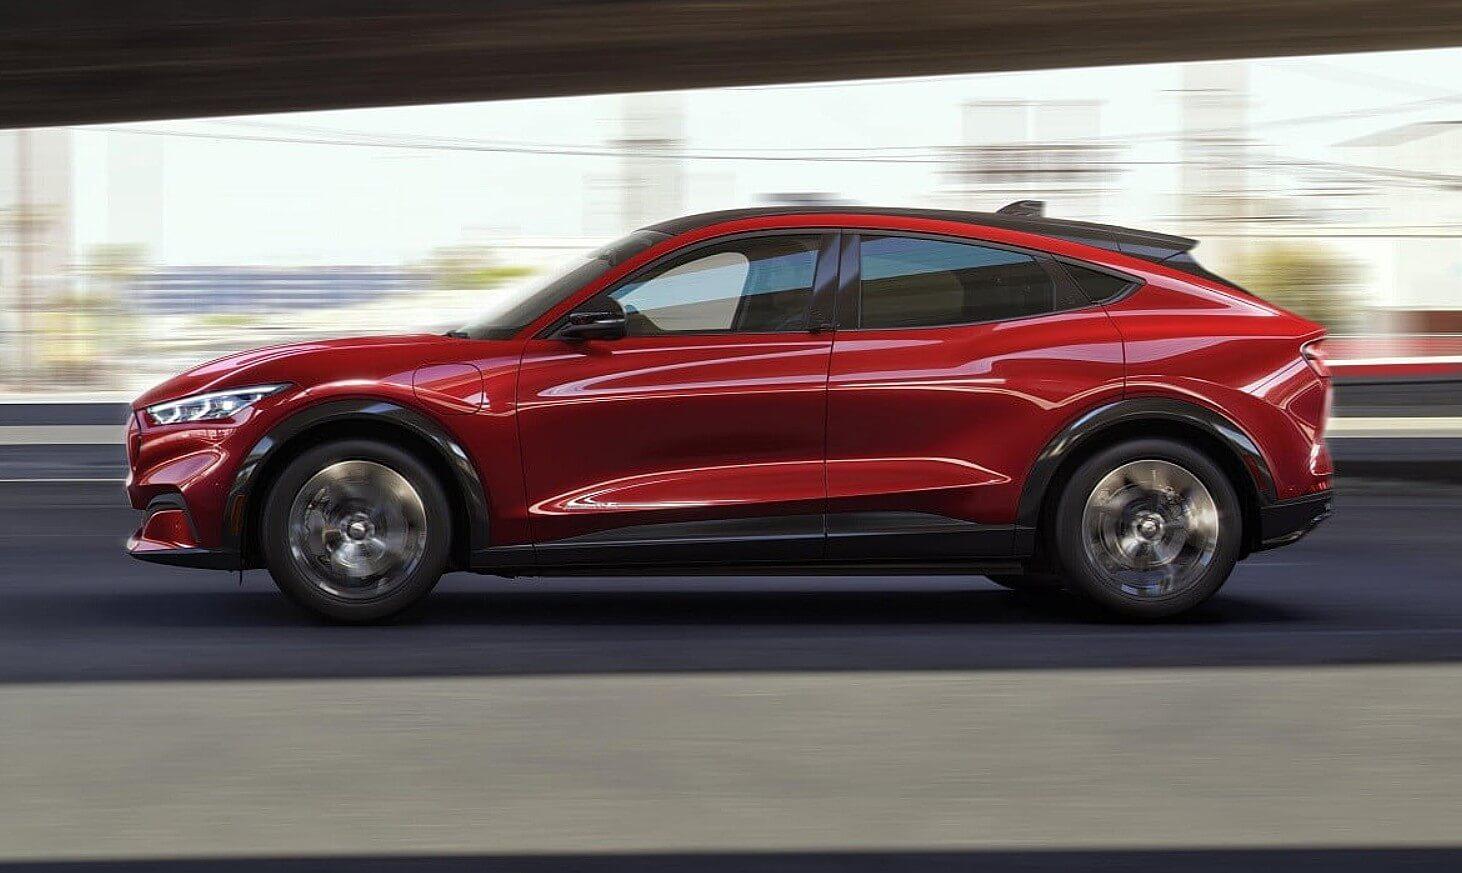 Ford борется с ранними проблемами программного обеспечения в Mustang Mach-E